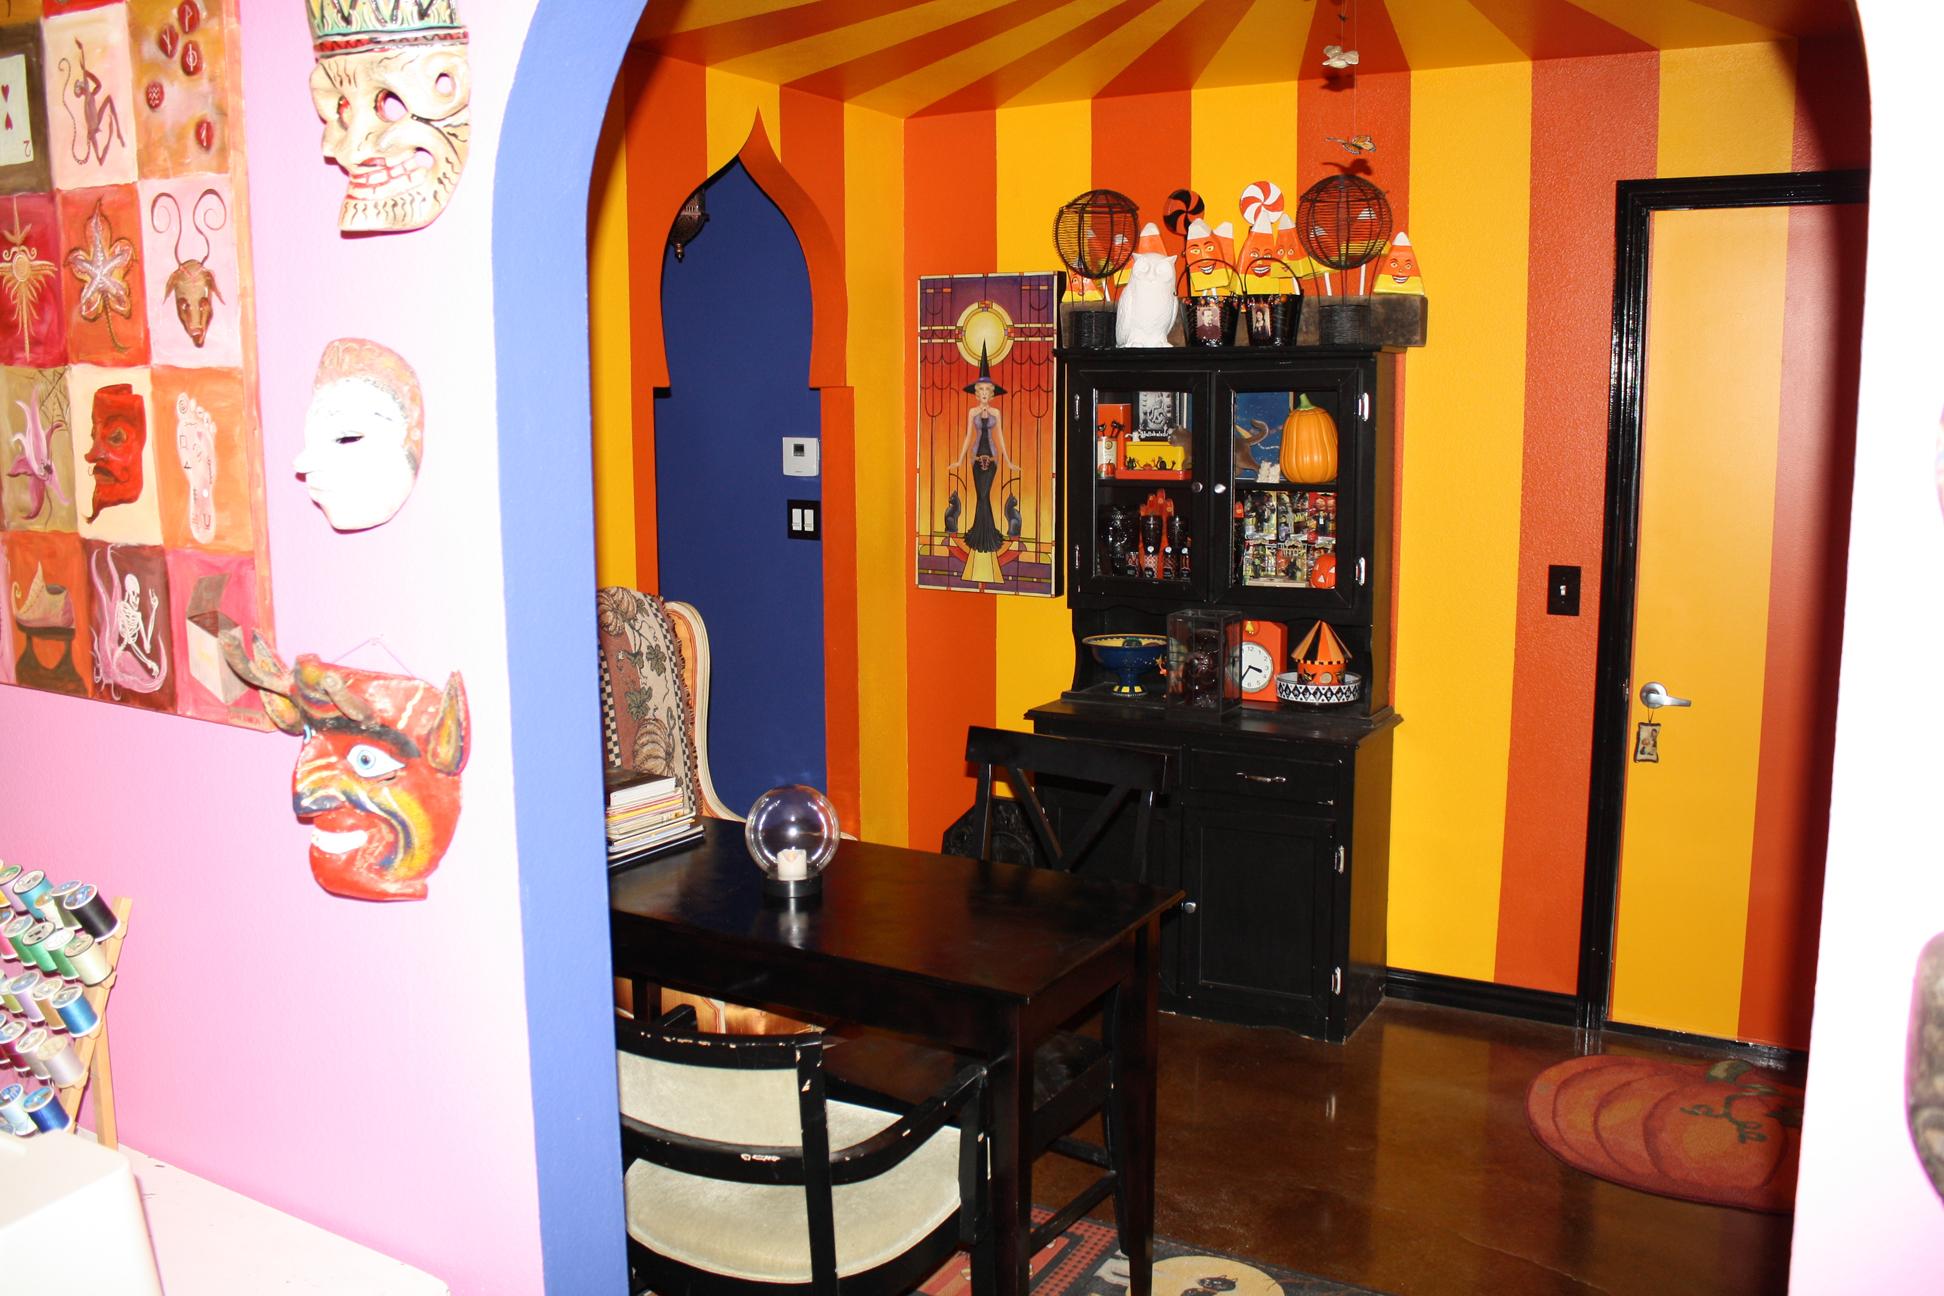 A peek into the Halloween Room